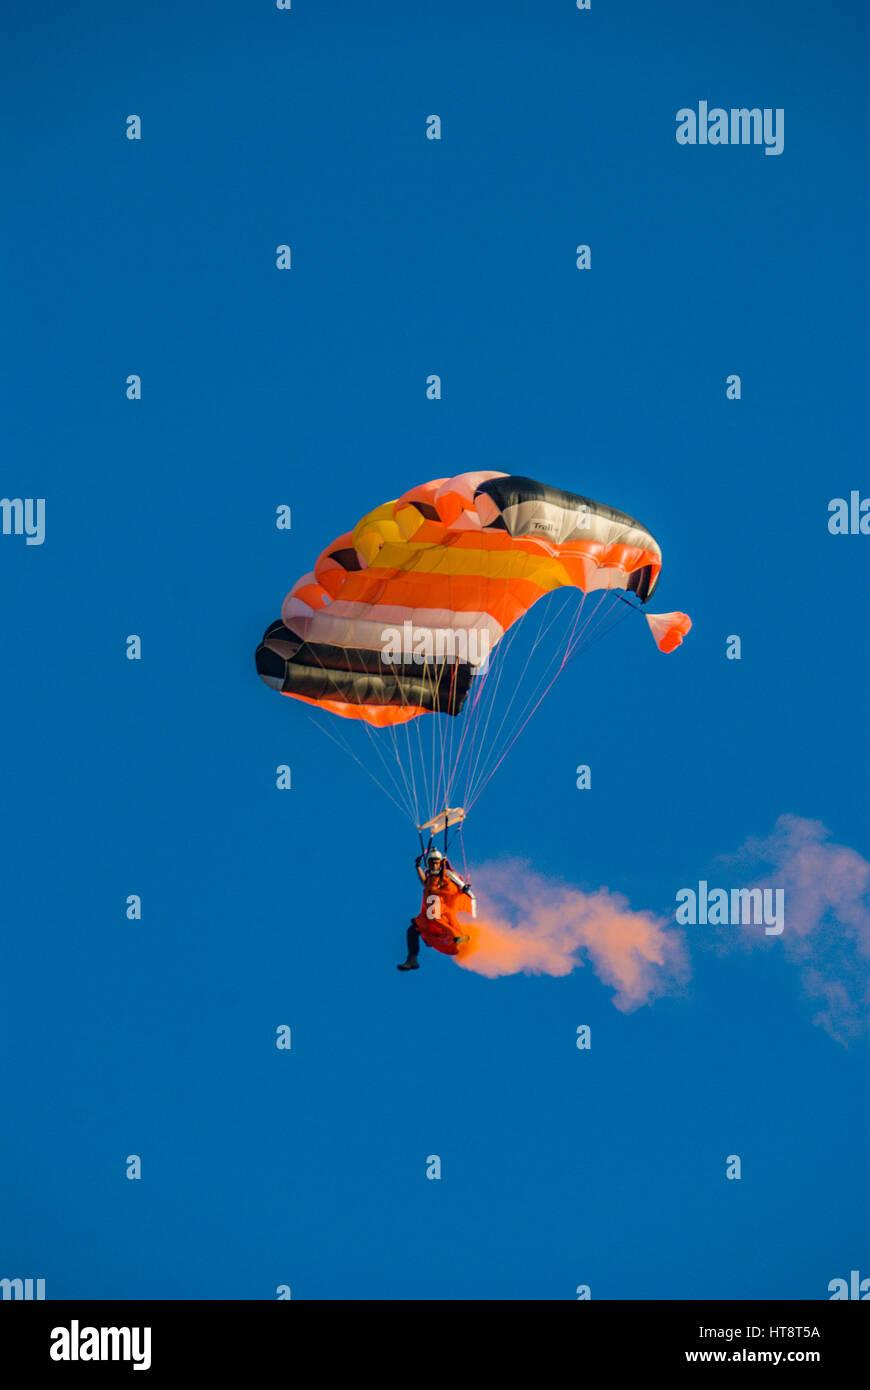 smoky skydiver performs acro show - Stock Image